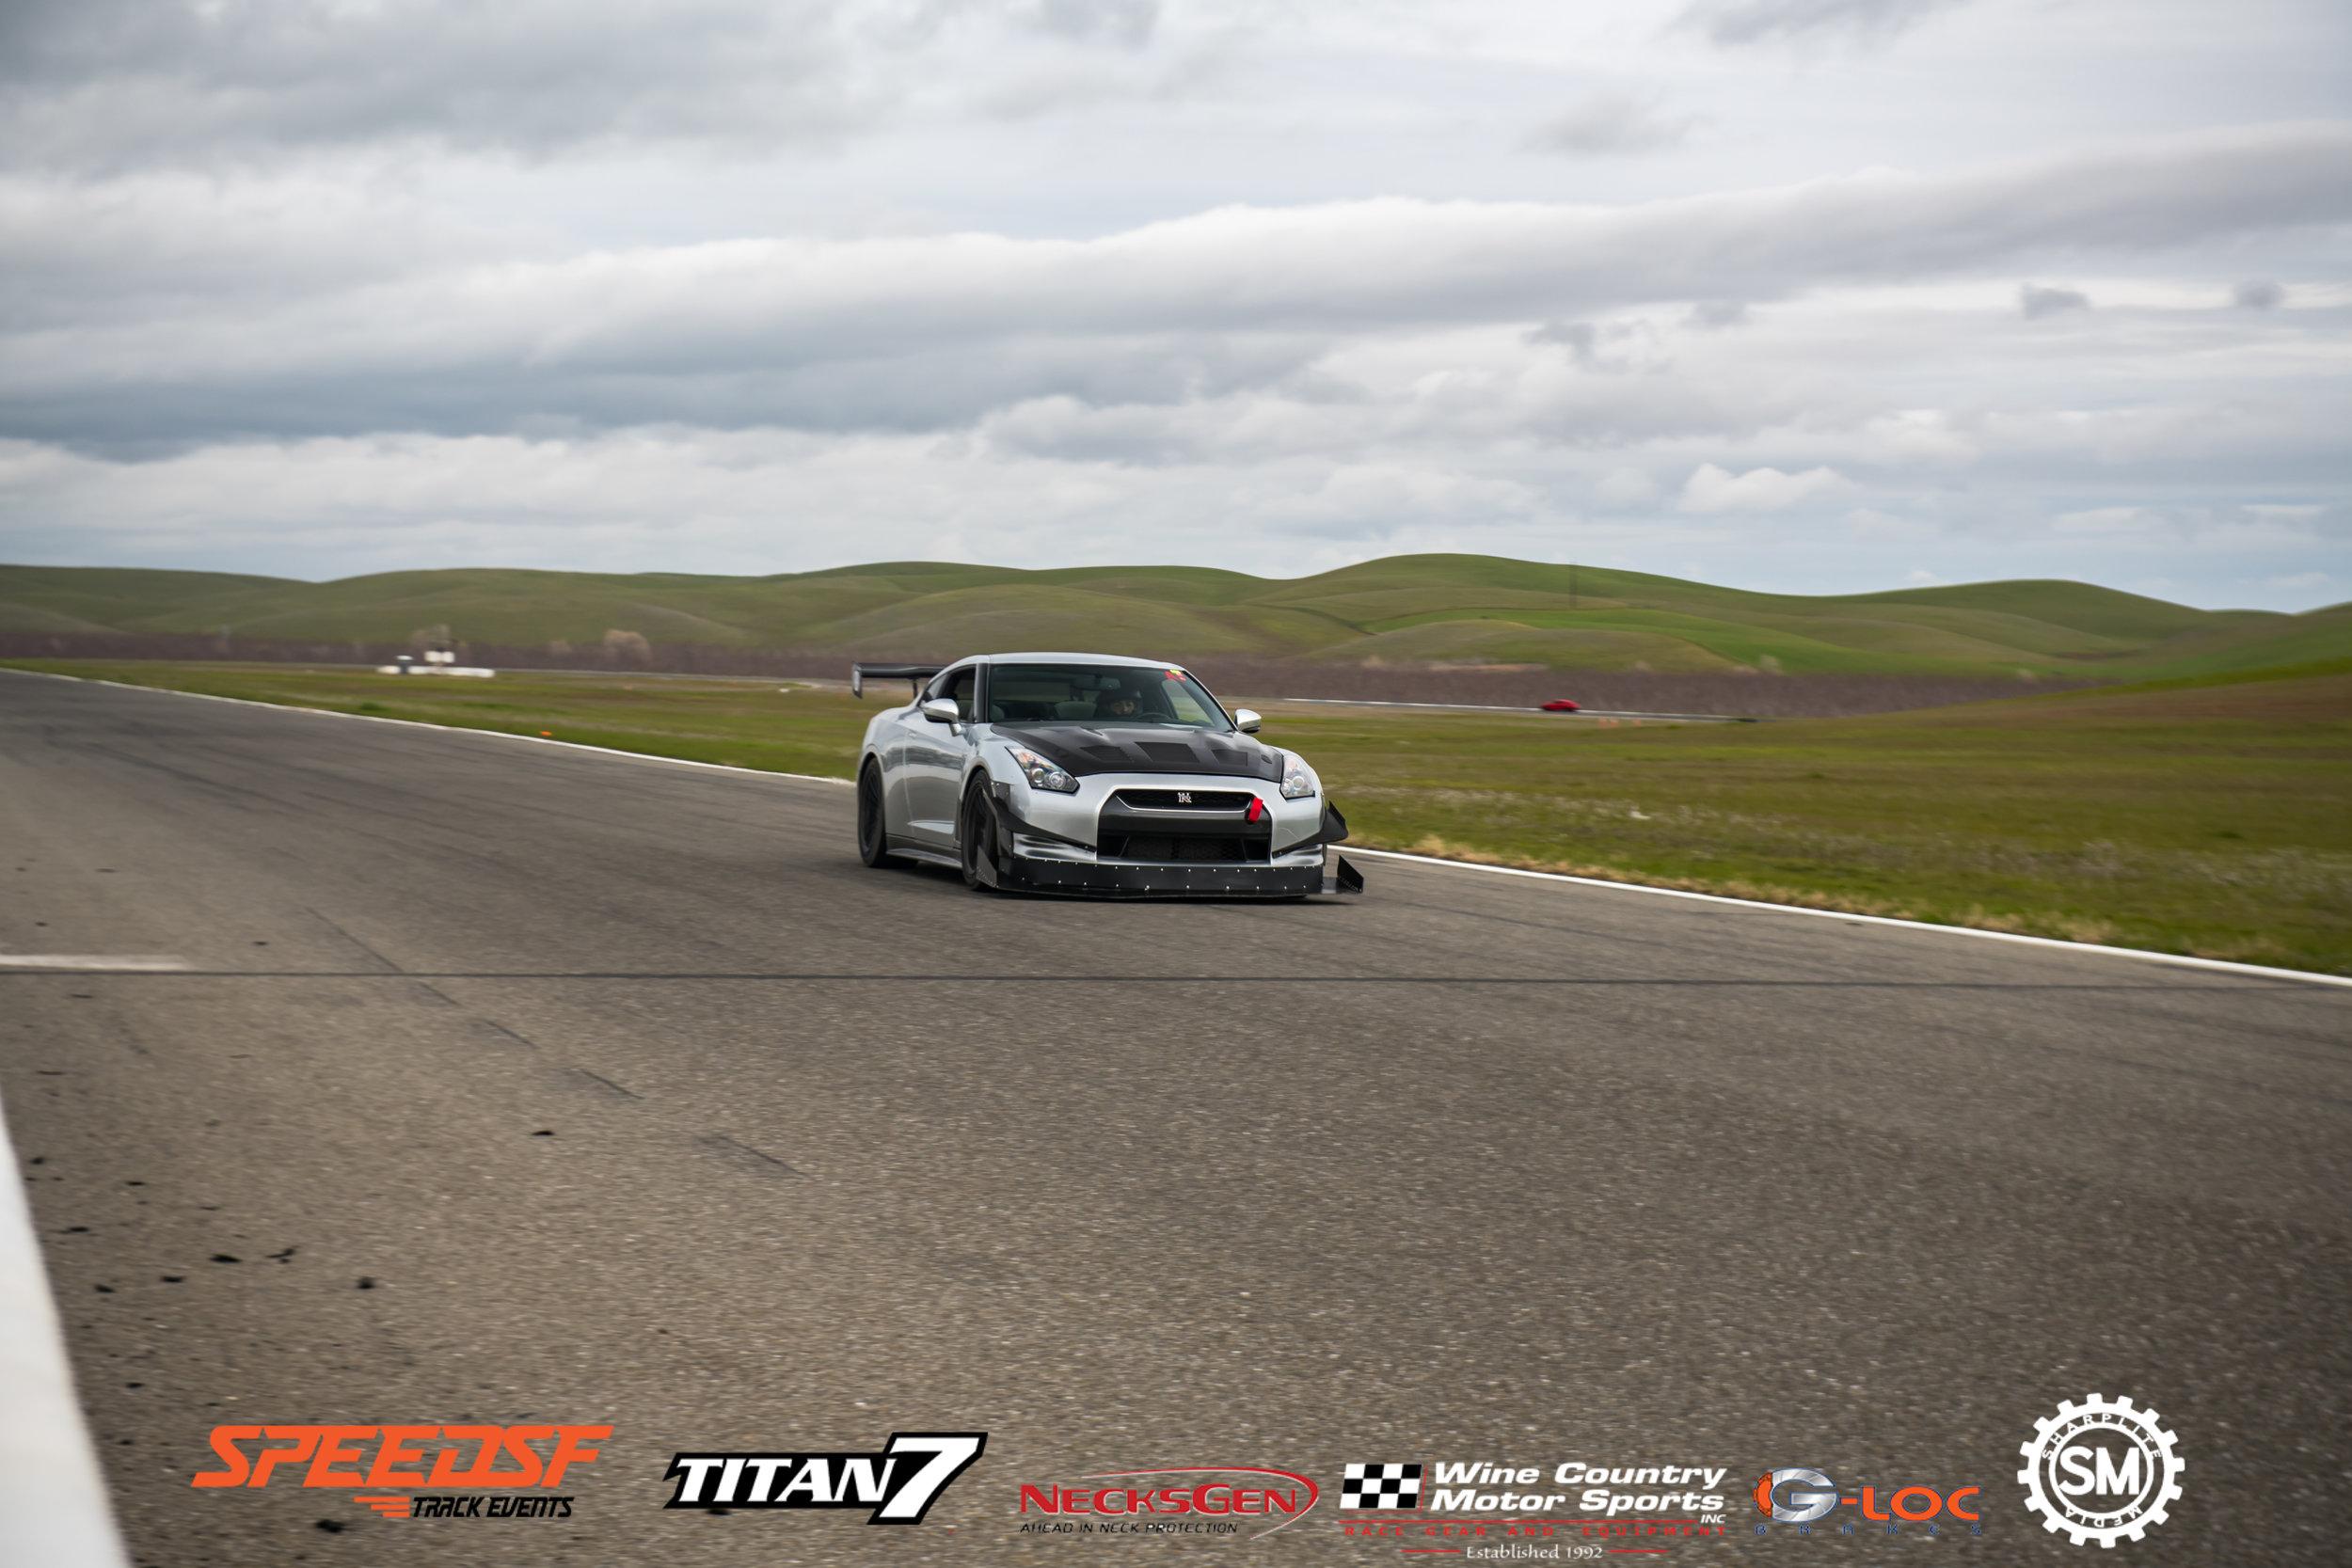 SpeedSF Thunderhill Sunday 02_24_2019-61.jpg